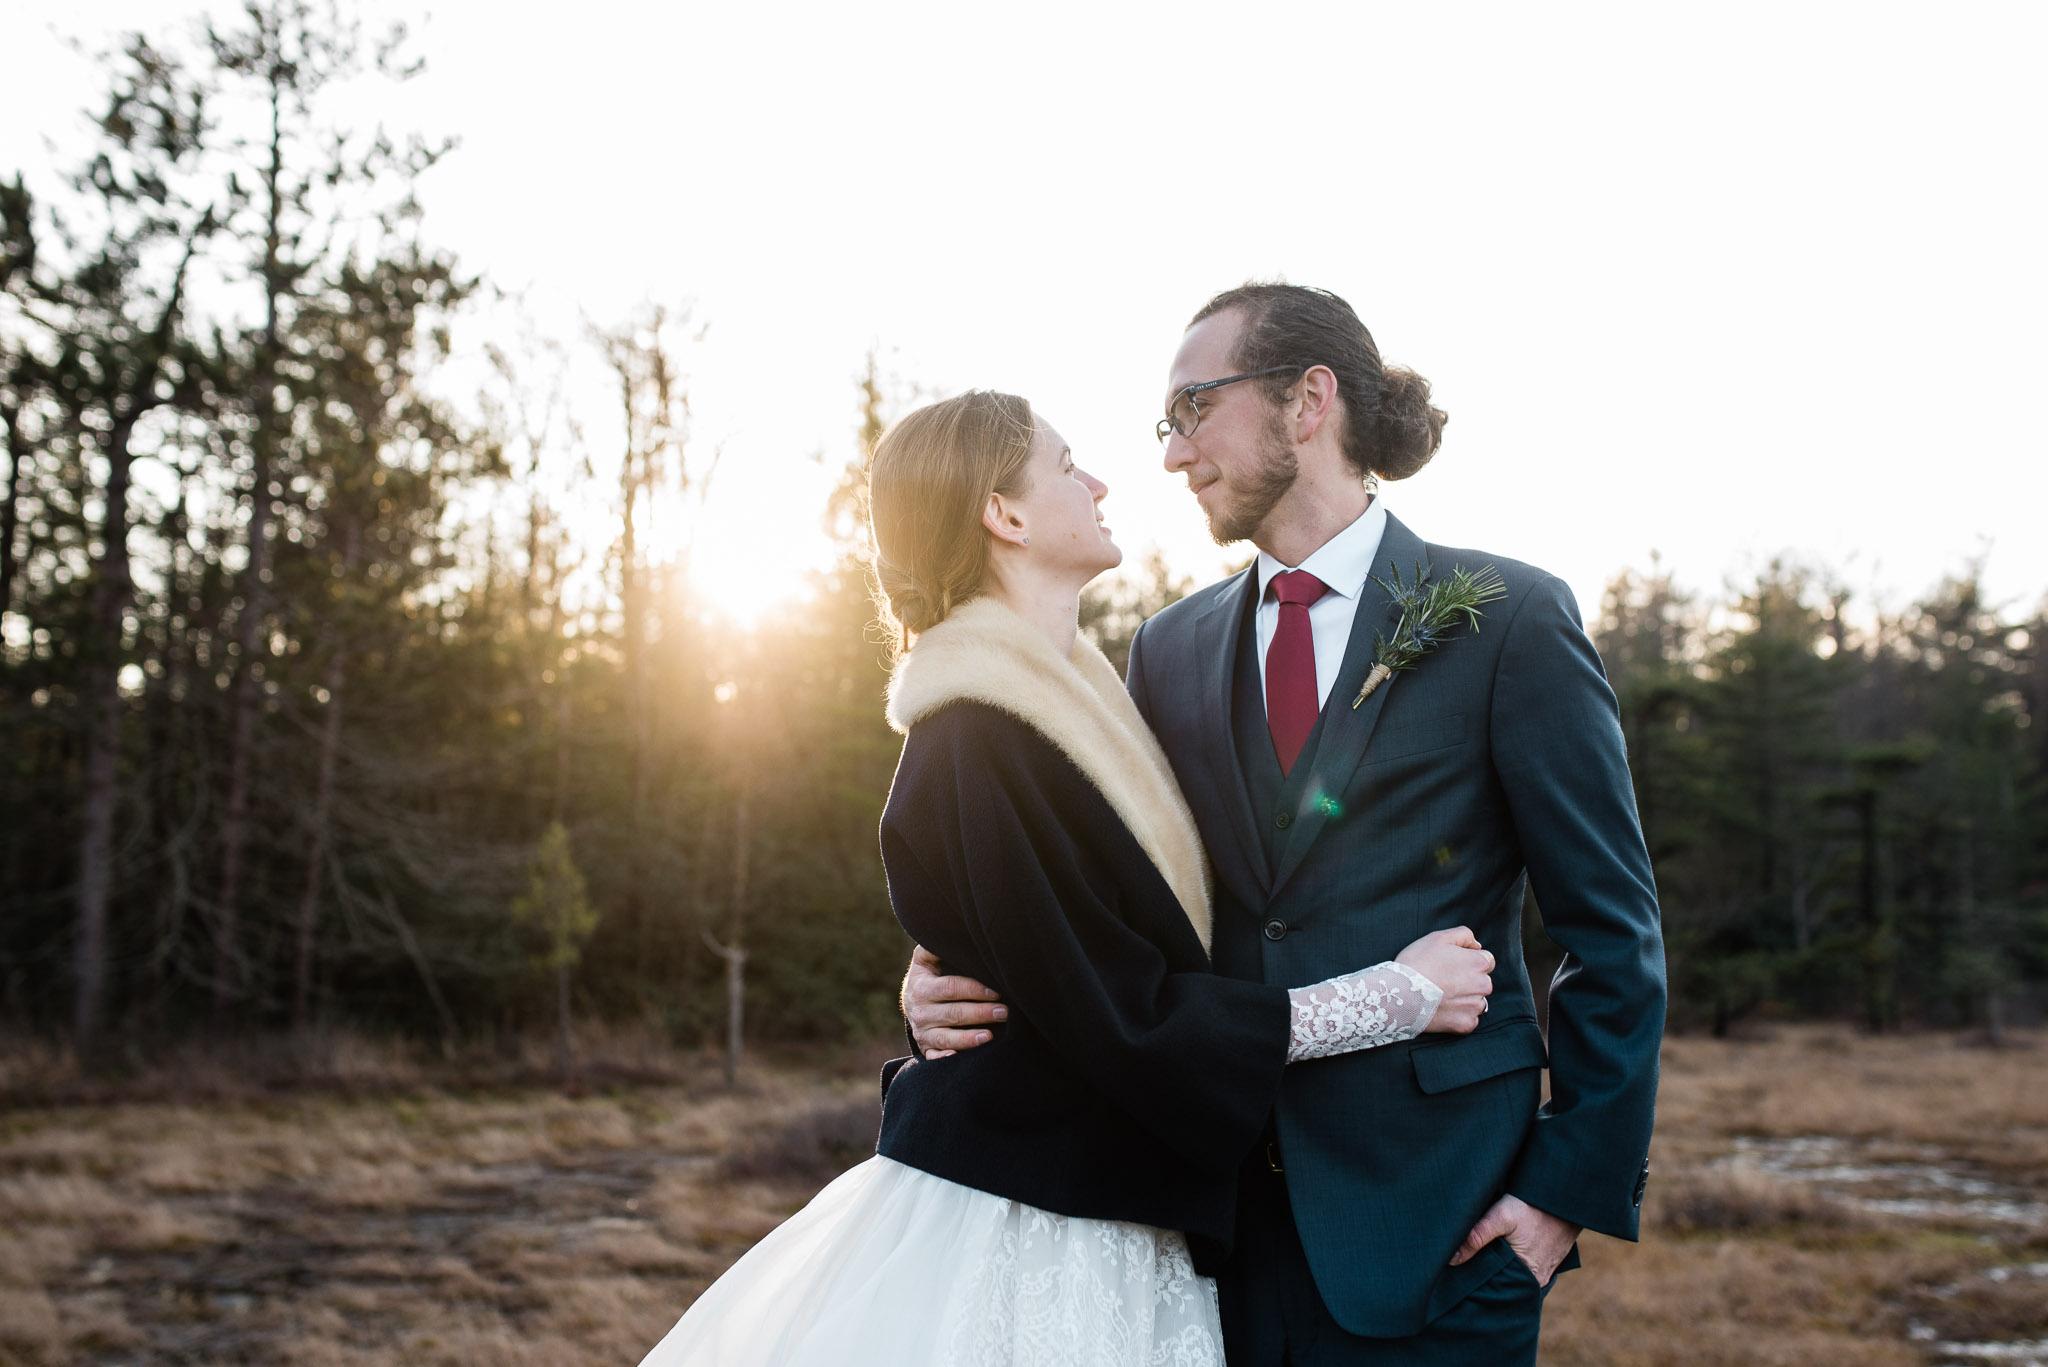 Wedding Couples portrait, Ligonier Wedding Photographer, Ligonier PA wedding, wedding potraits-6880.jpg